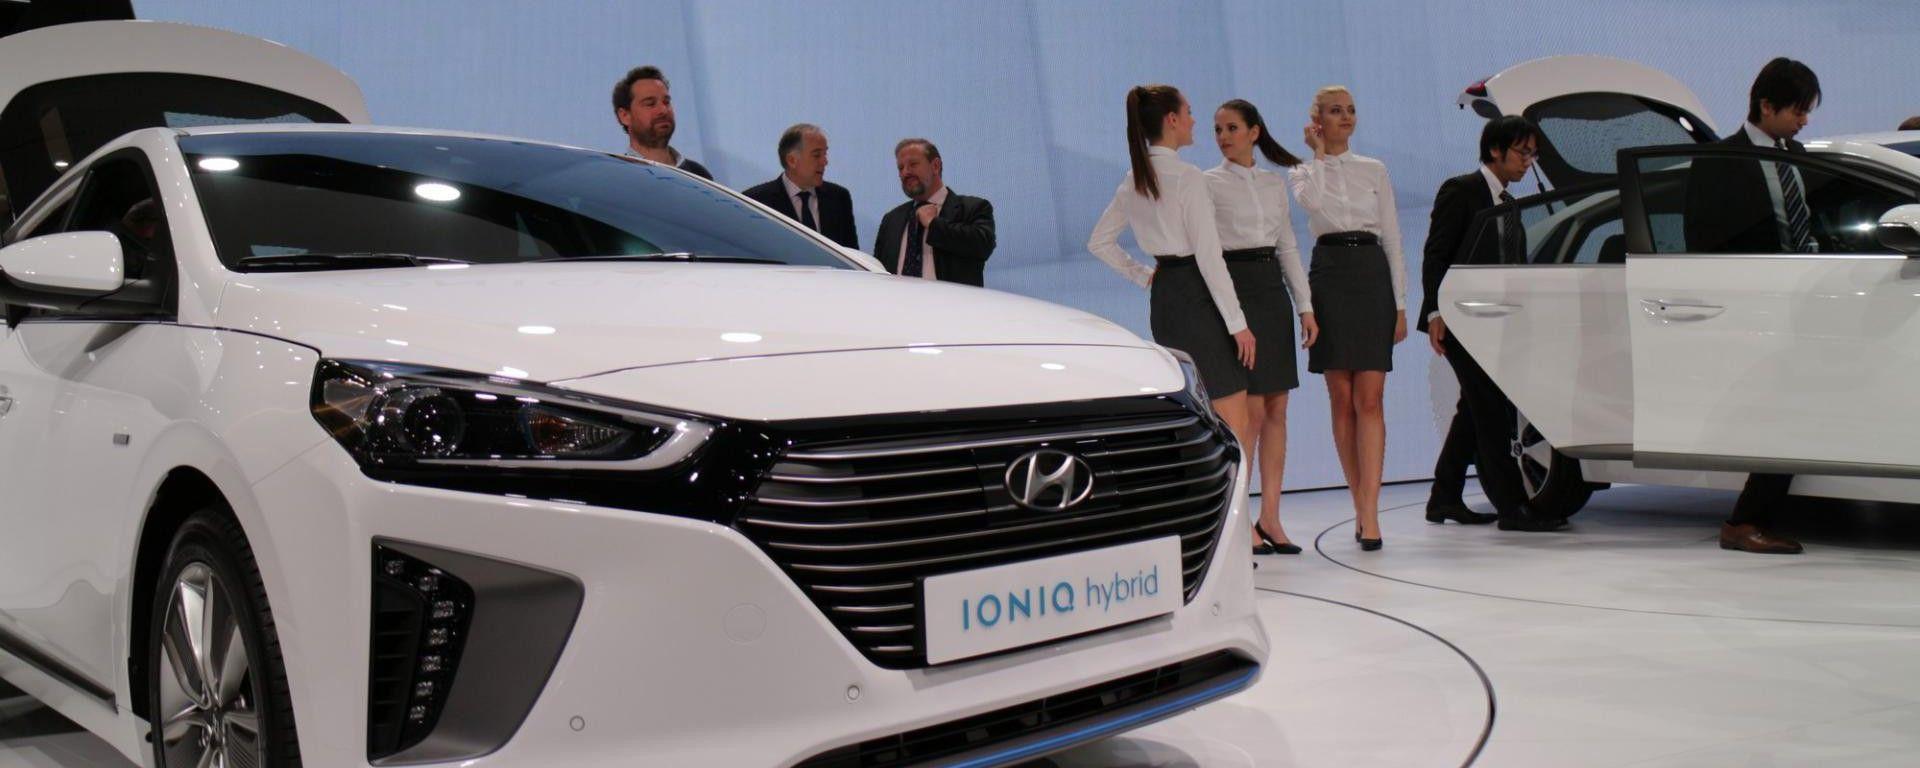 Ginevra 2016 - Notizie dalle Case: Hyundai